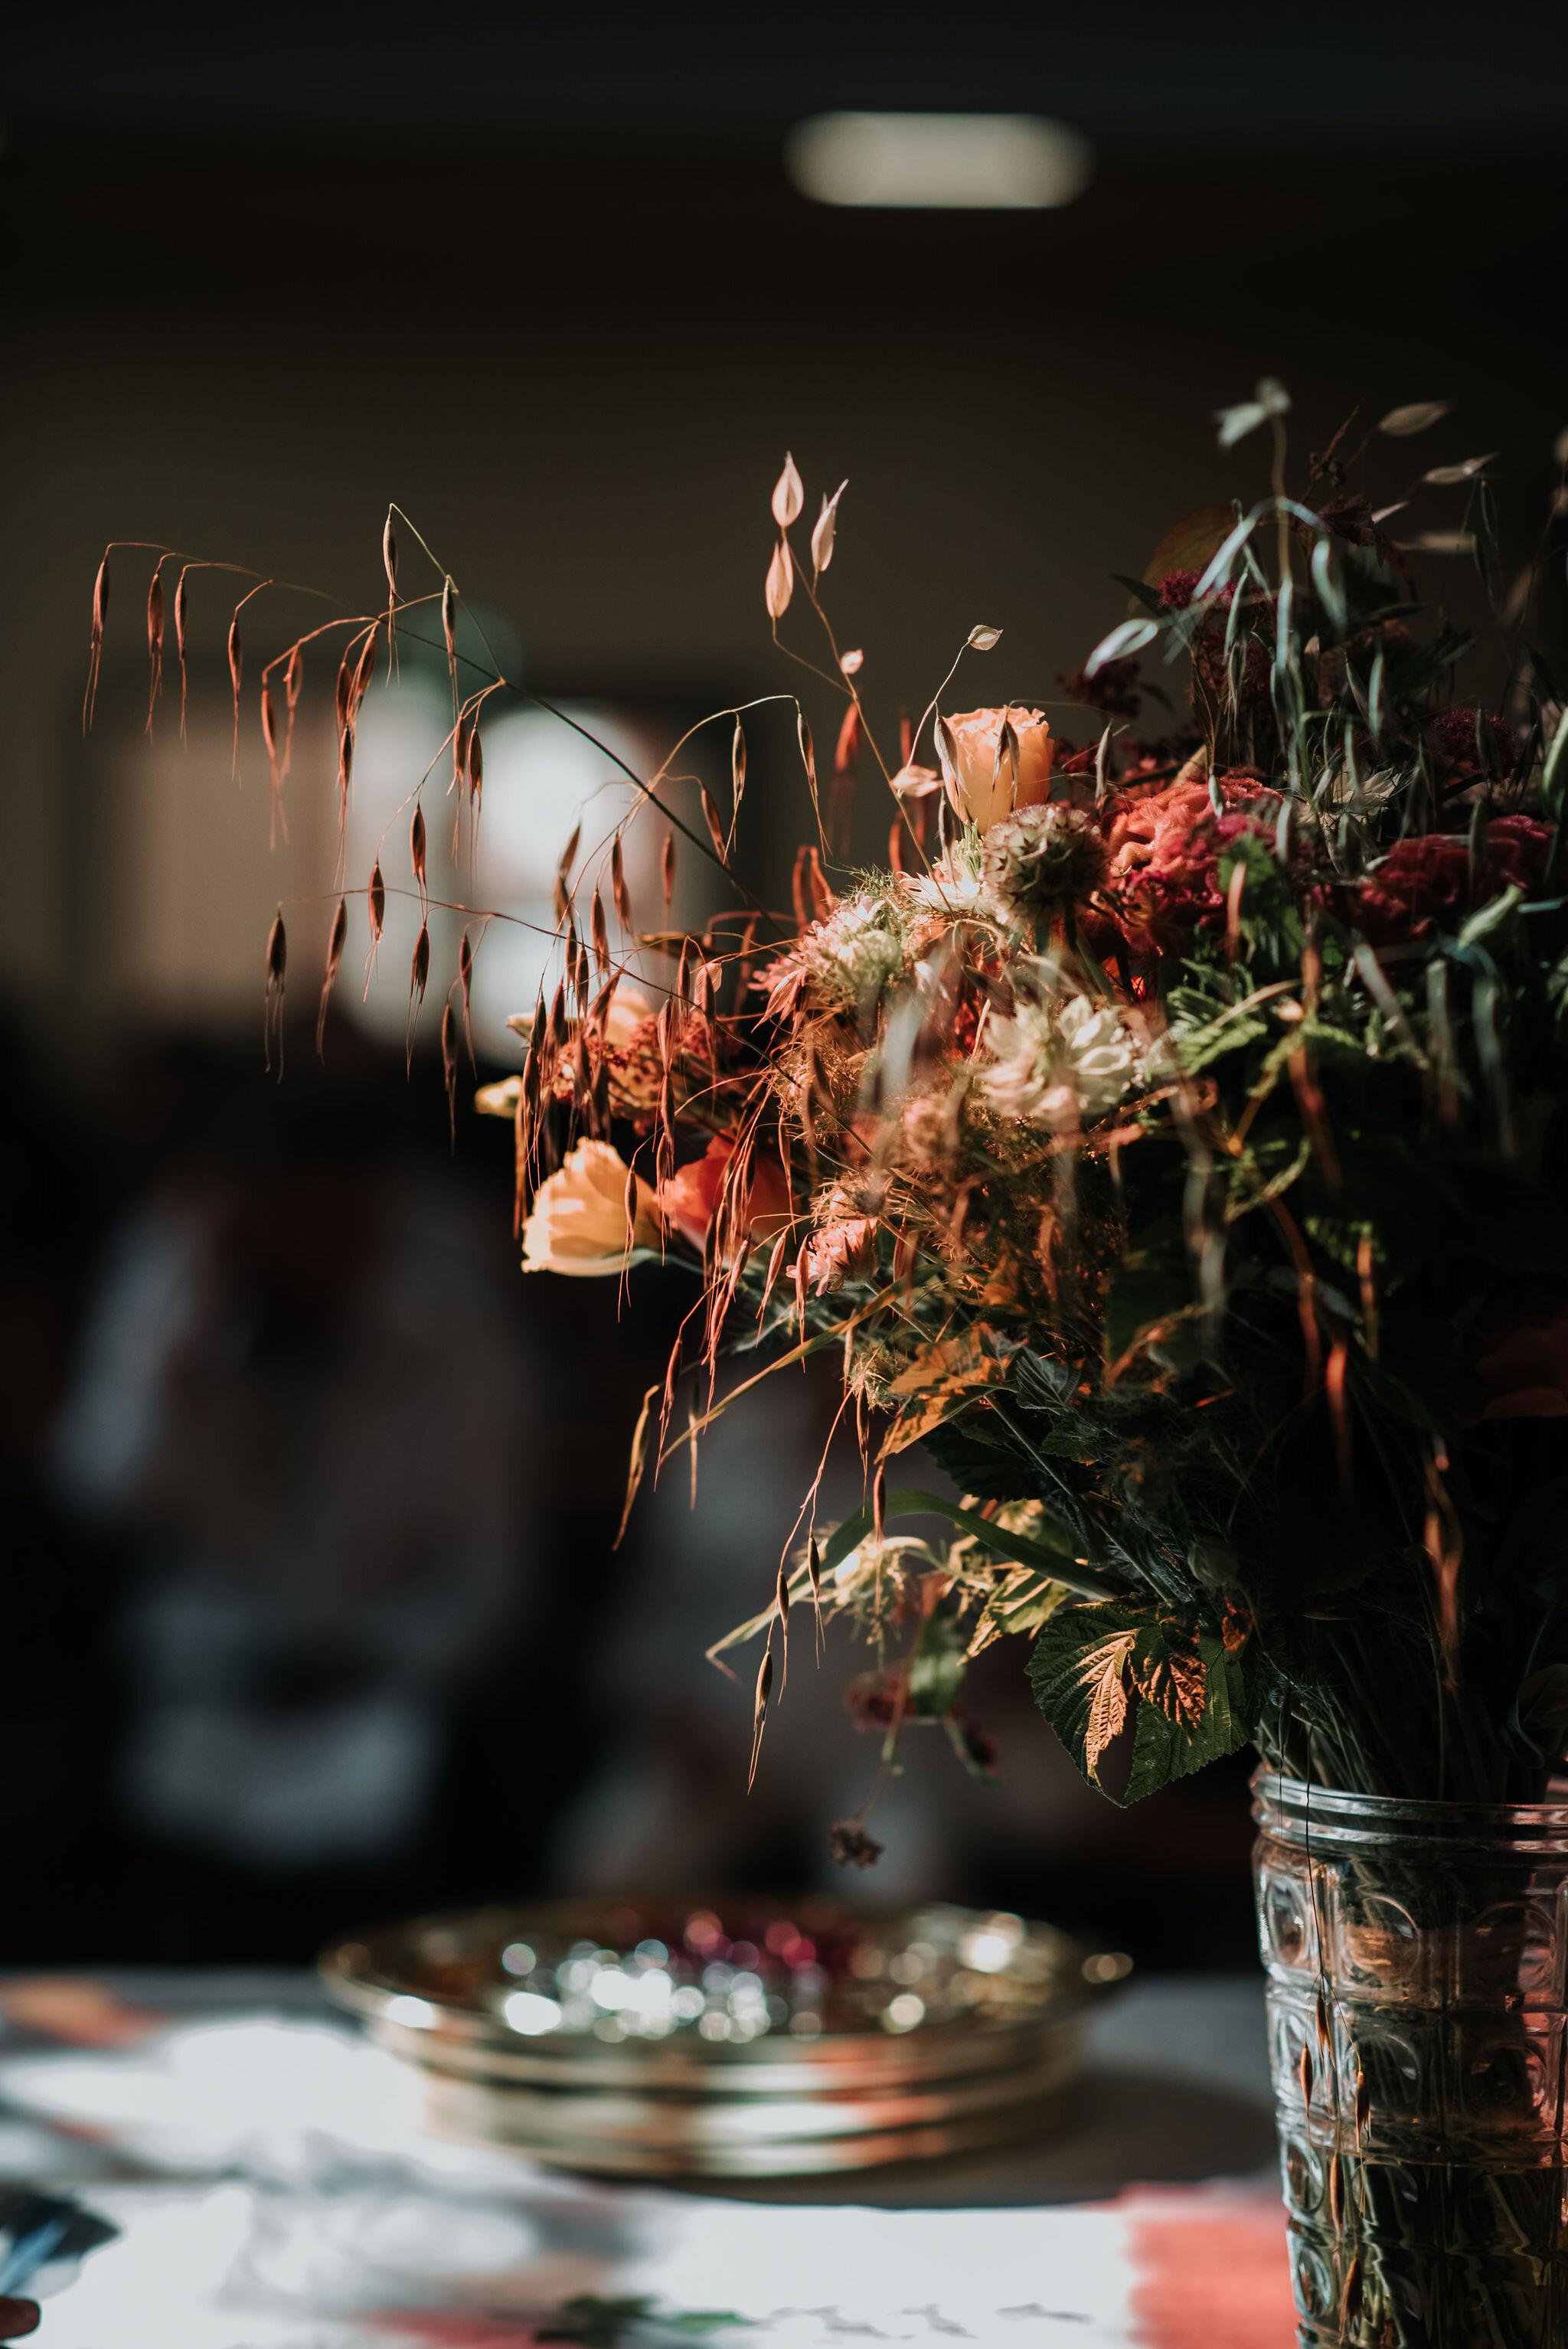 Léa-Fery-Photographe-Bretagne-Mariage-Famille-2349.jpg